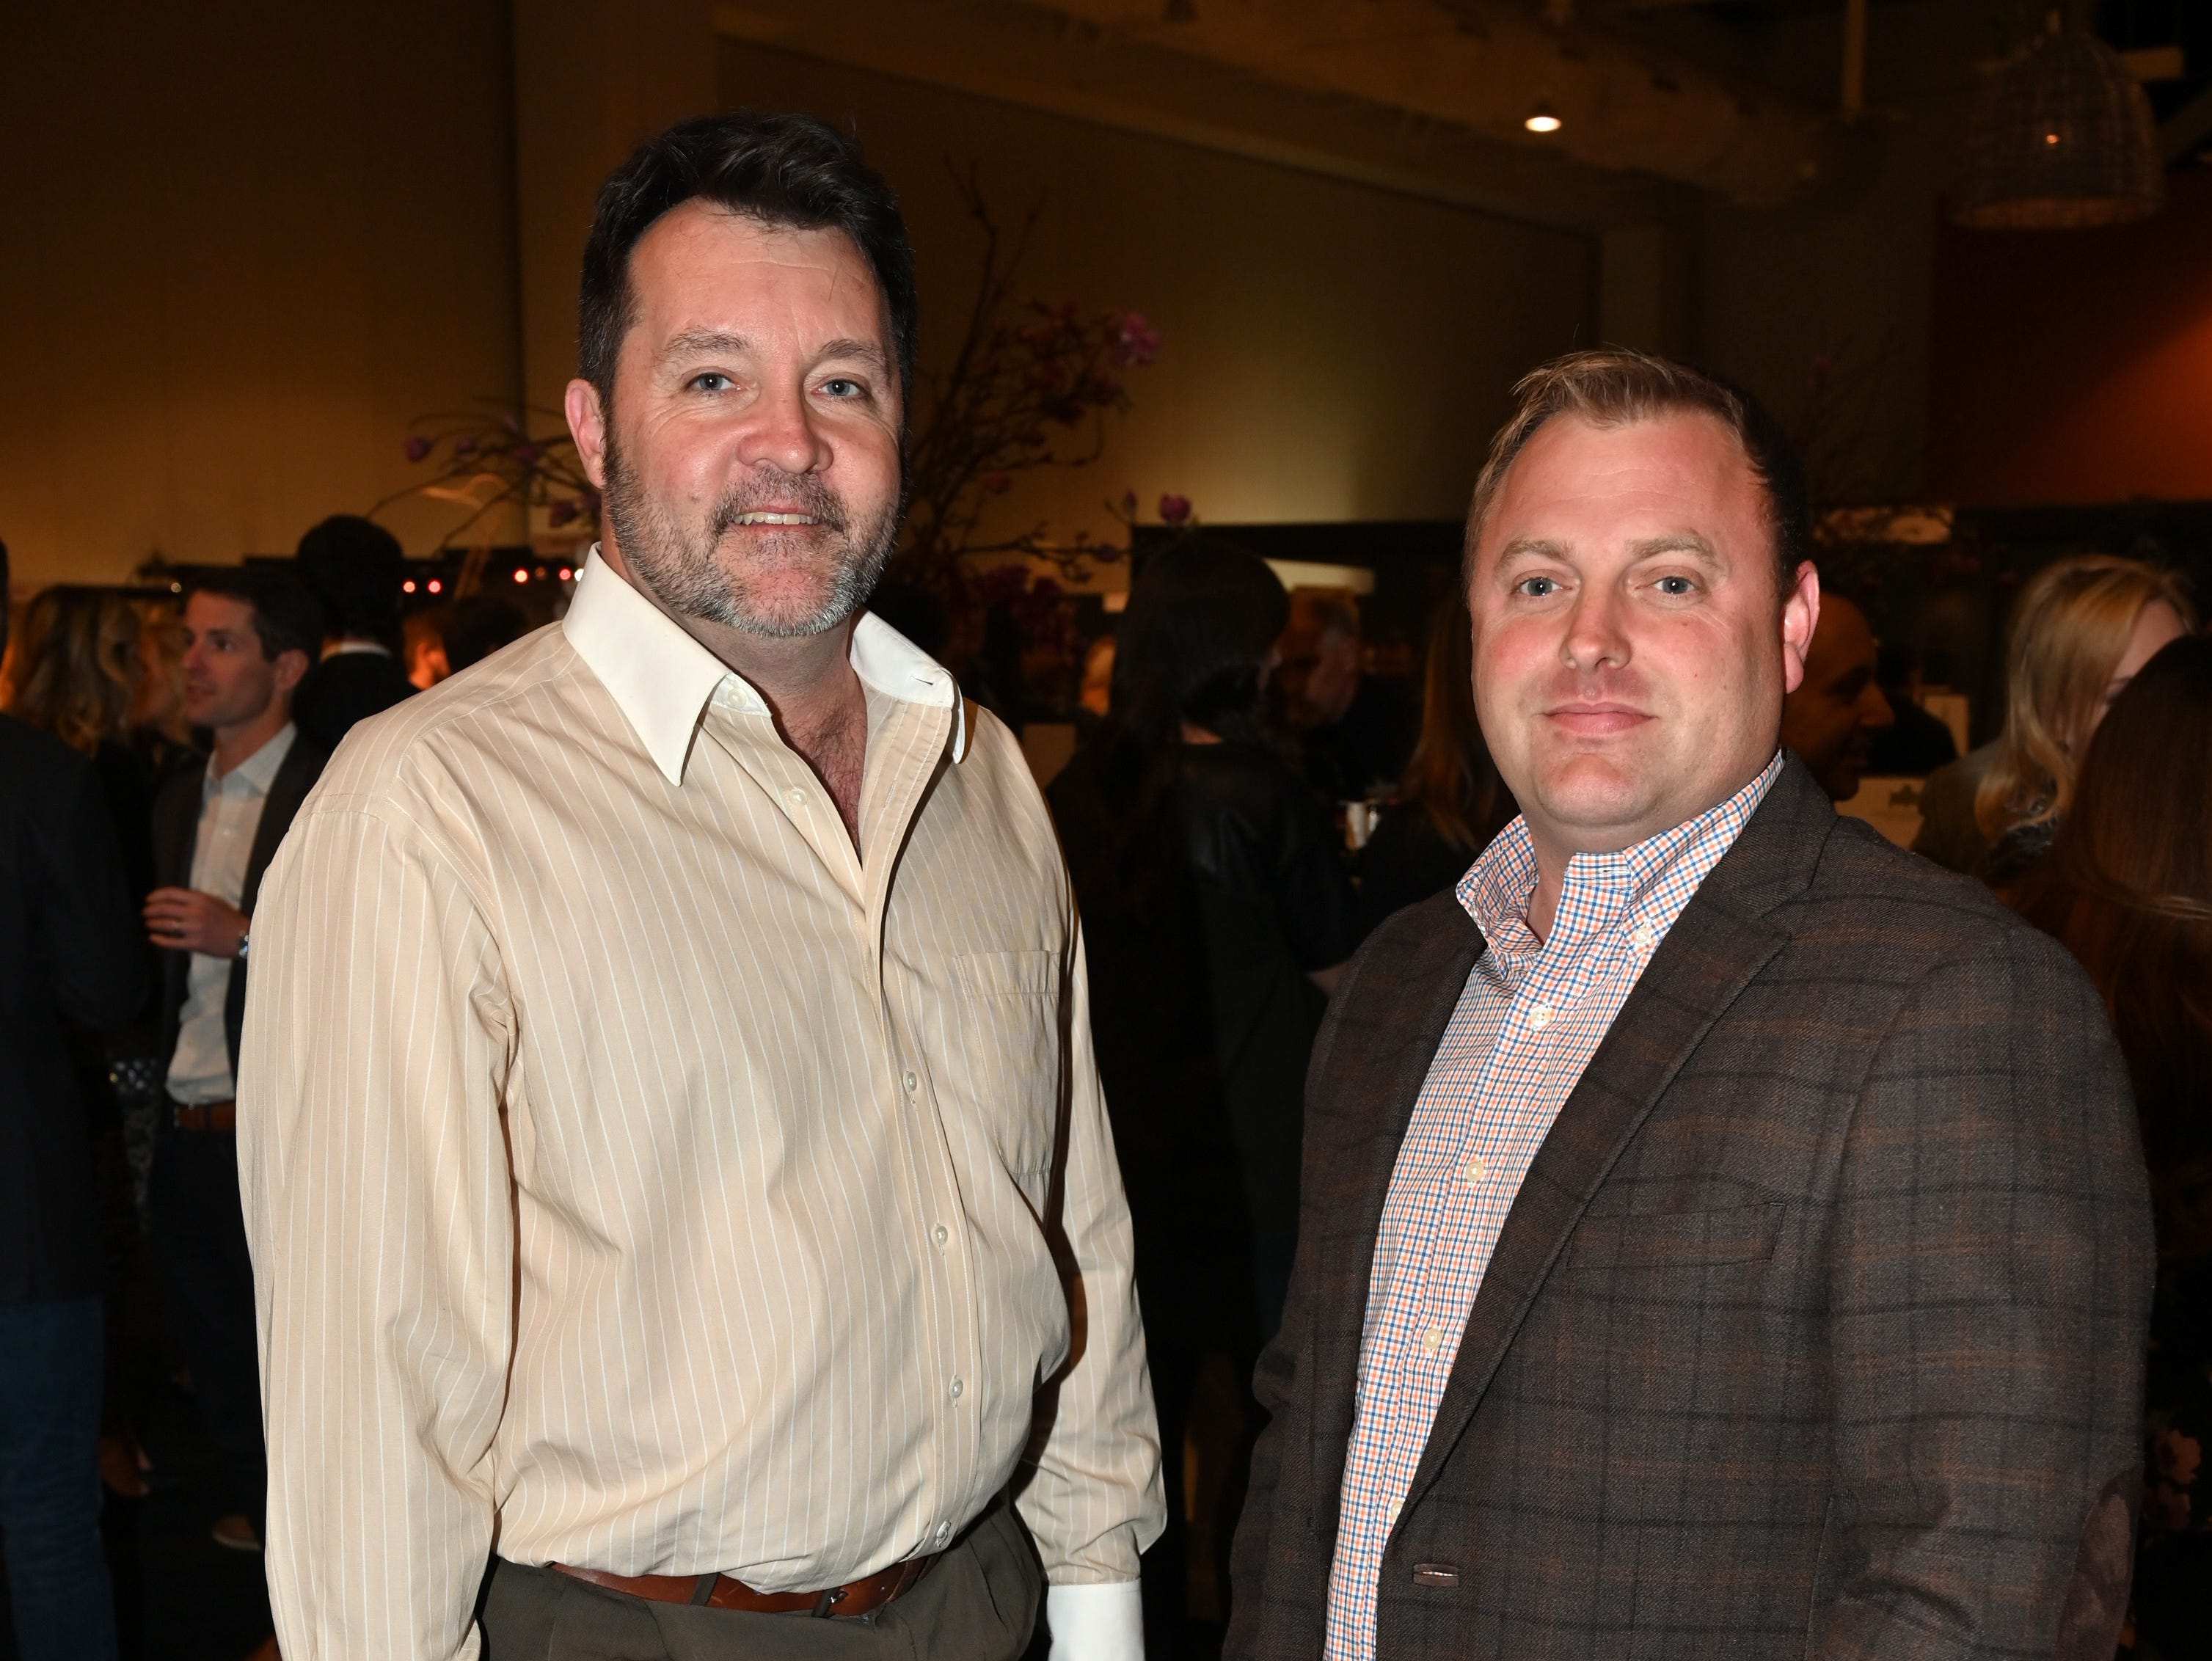 Todd Breyer and Josiah Lockard